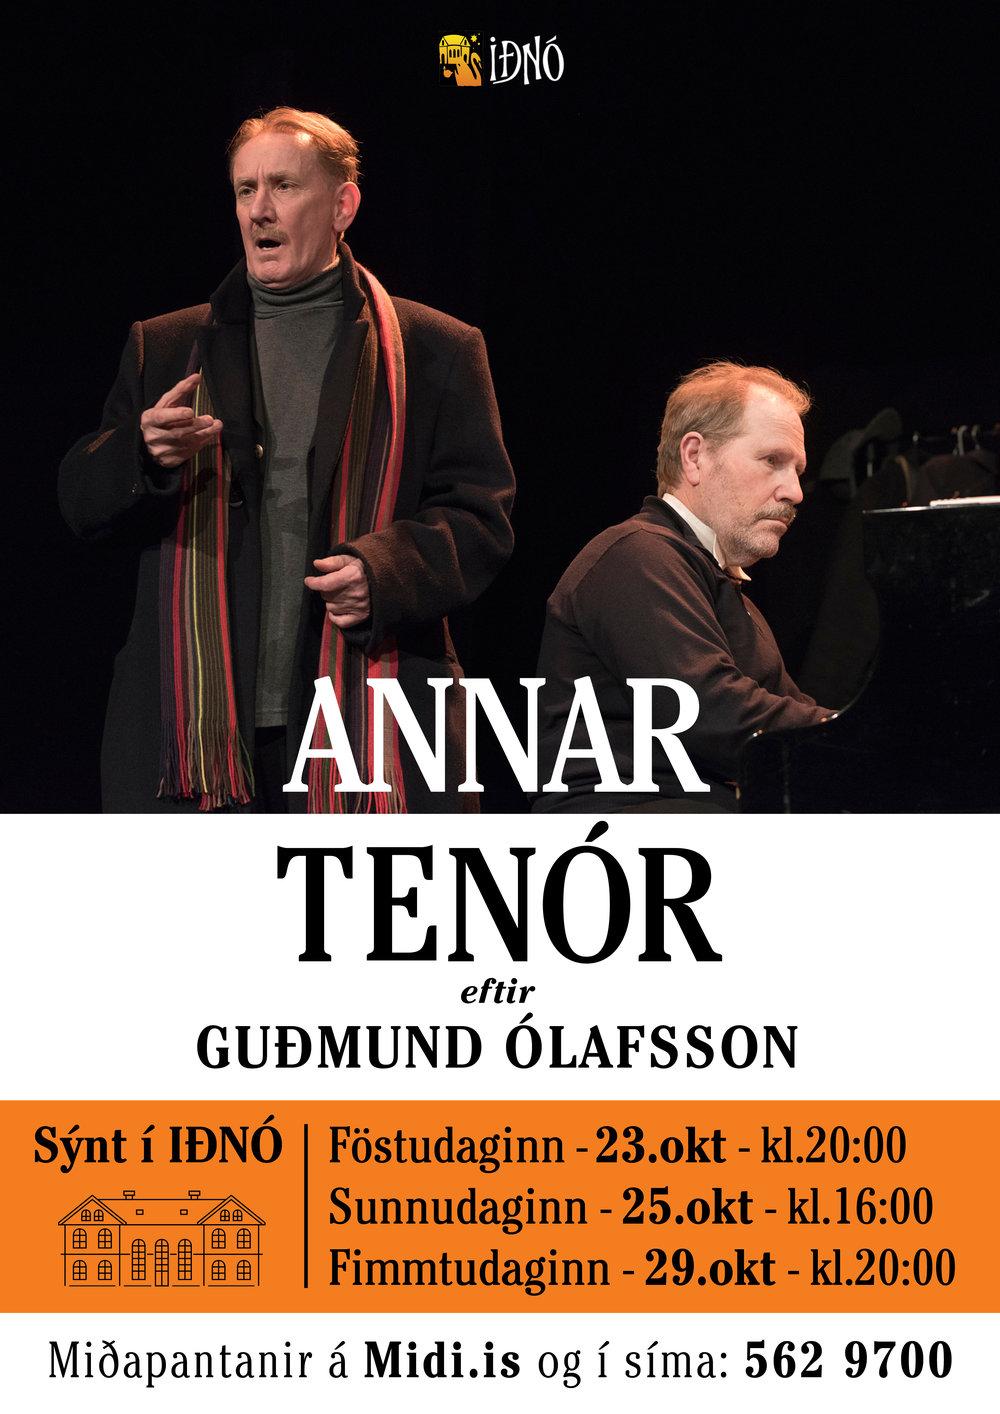 annar tenor_okt_2015-01.jpg